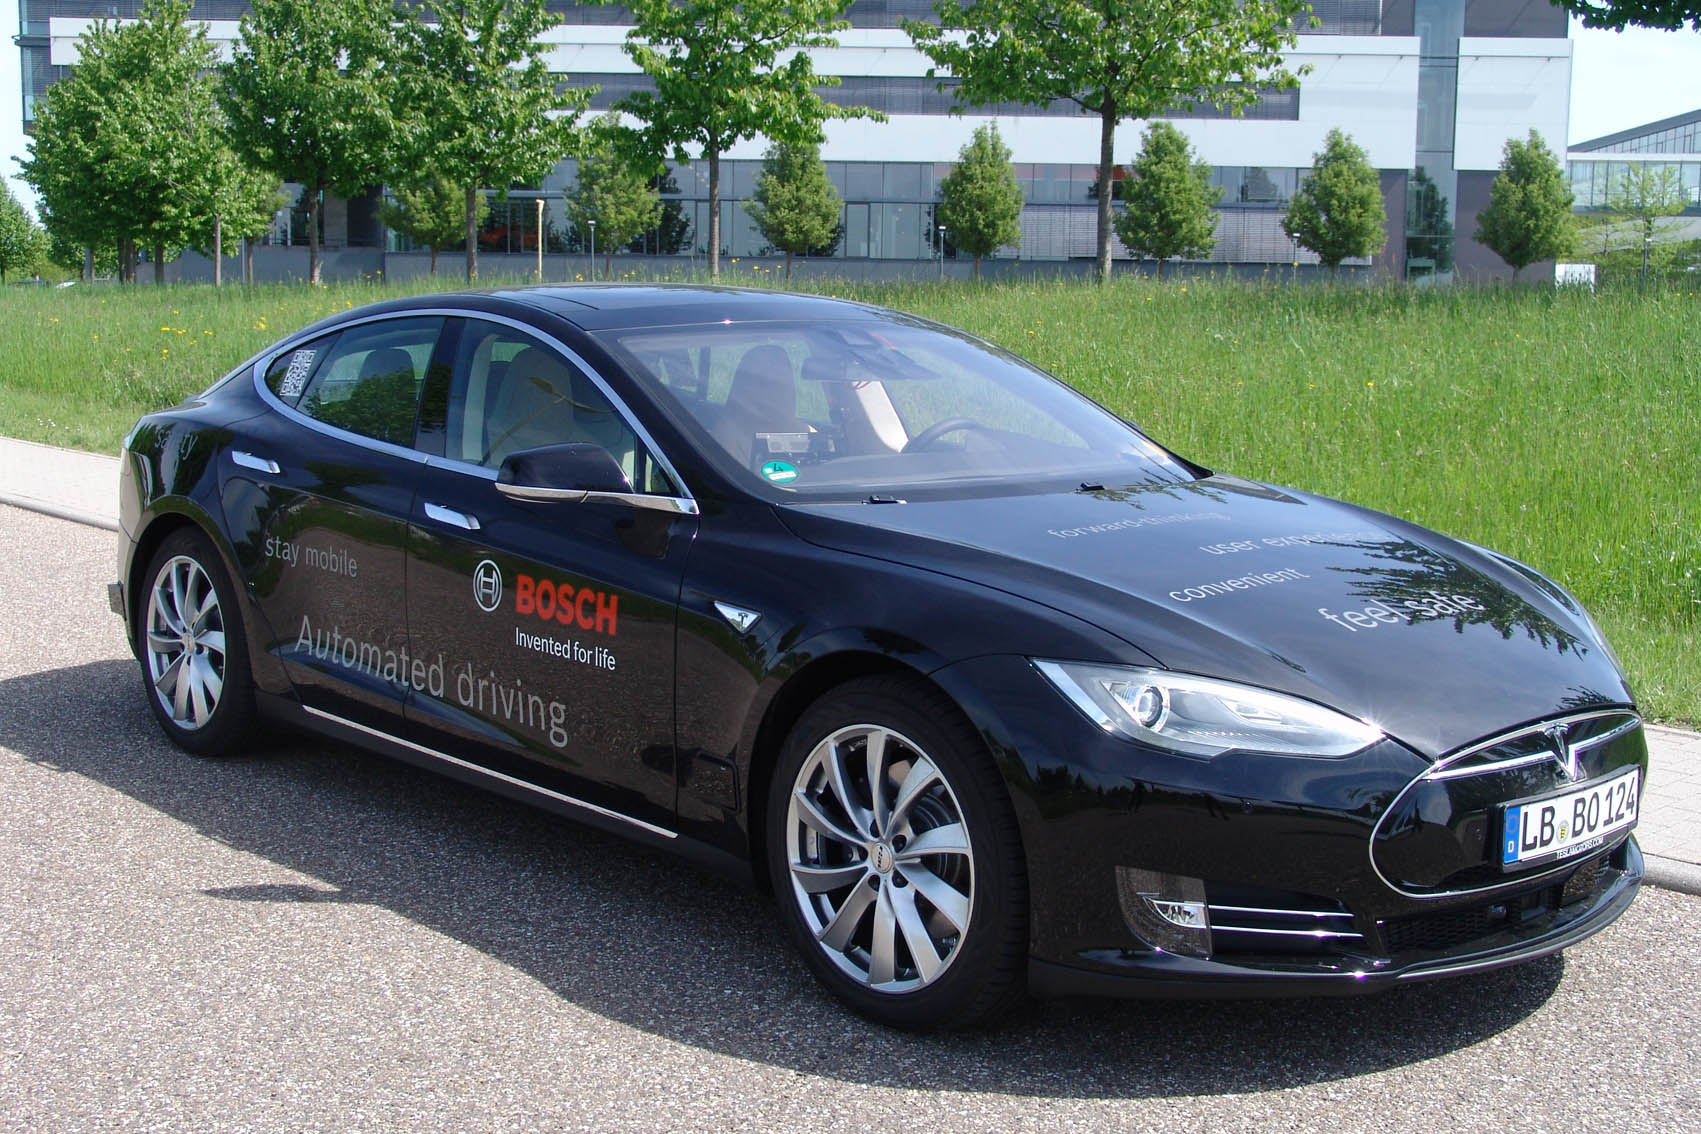 Rang lista lidera u tehnologiji autonomne vožnje